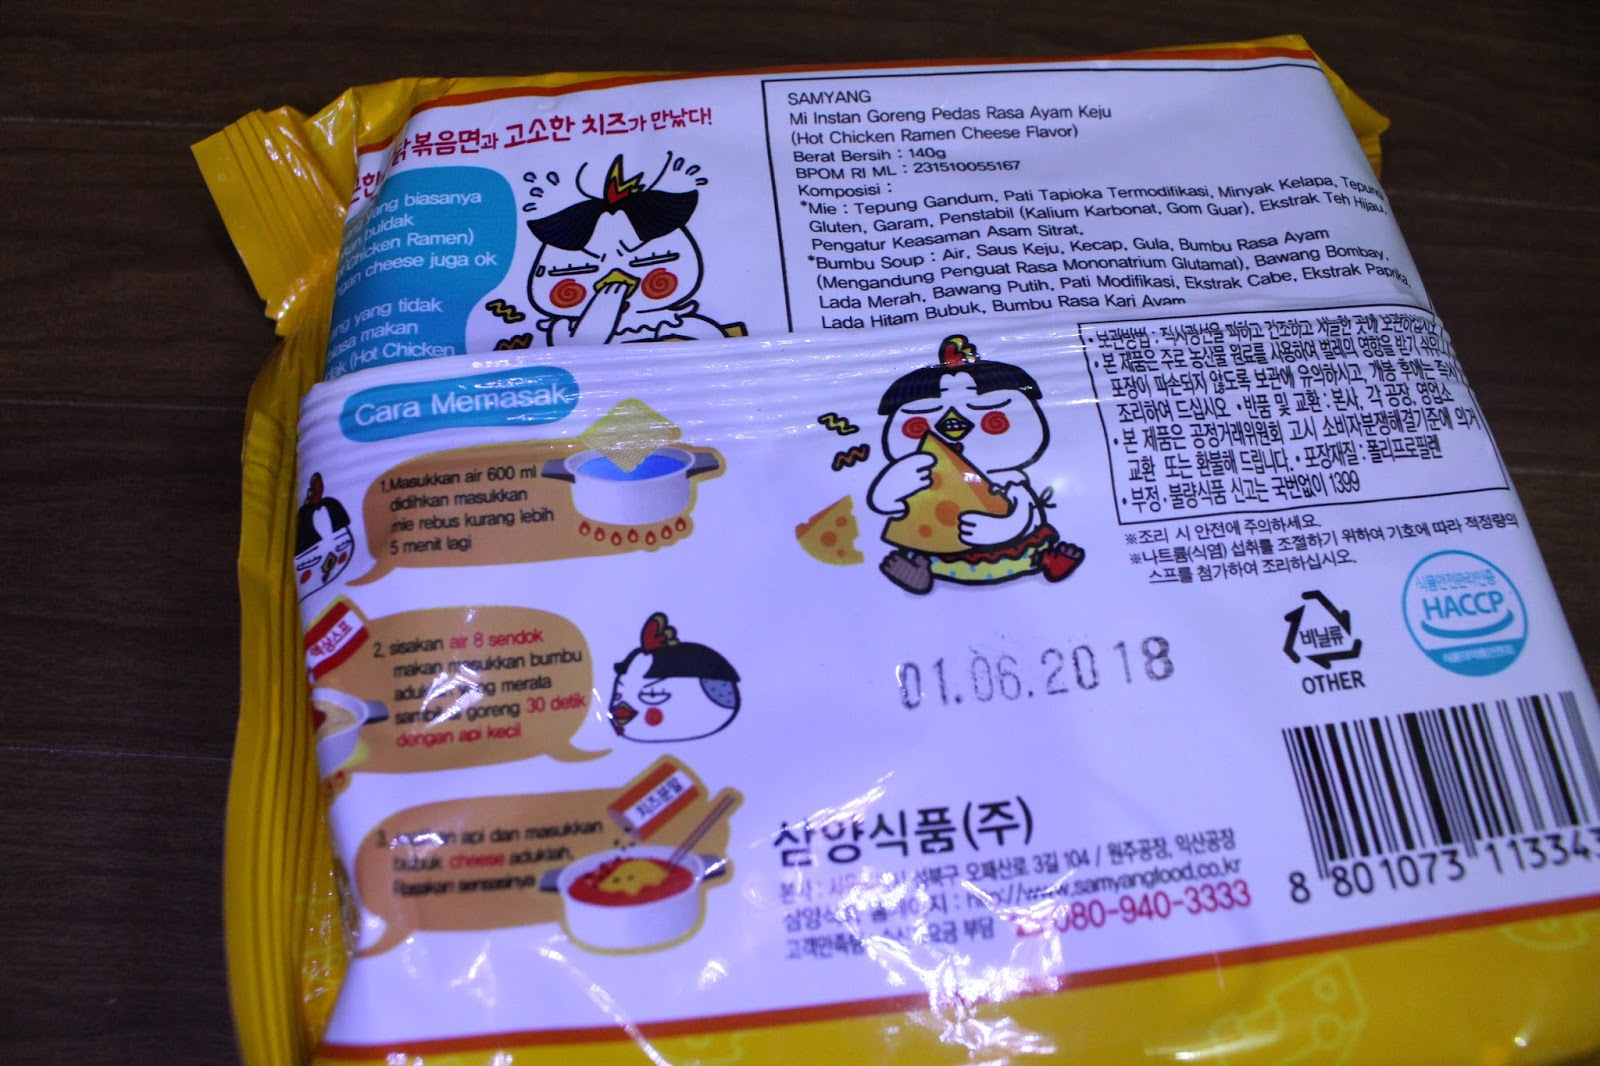 Review By Ratnaliem 2017 Dapat 3 Samyang Chese Ramen 140 Gr Mengeluarkan Lumayan Banyak Pilihan Hot Chicken Cool Stew Cheese Dan Mala